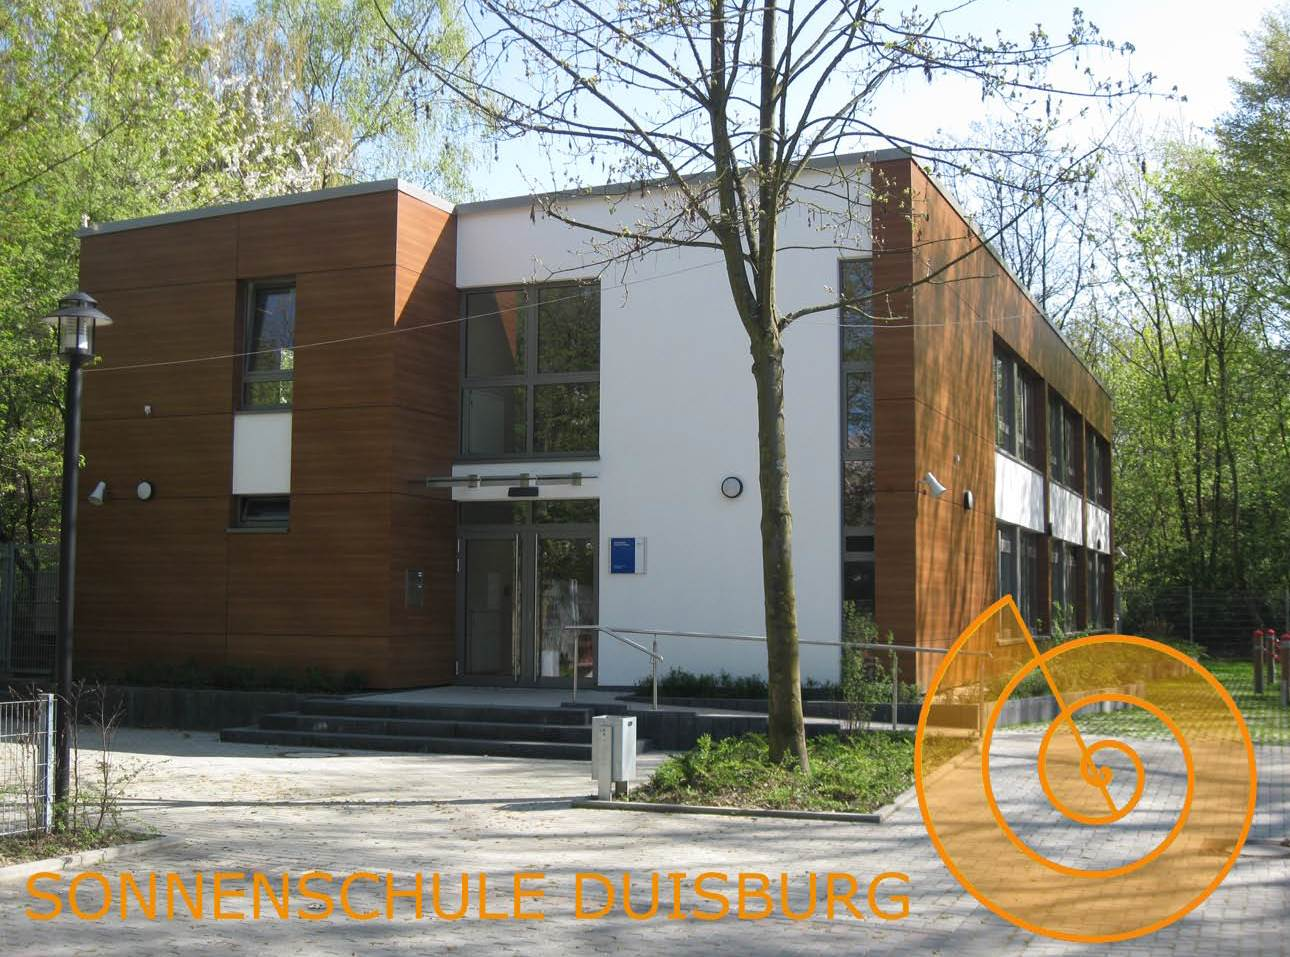 Sonnenschule Duisburg Bild